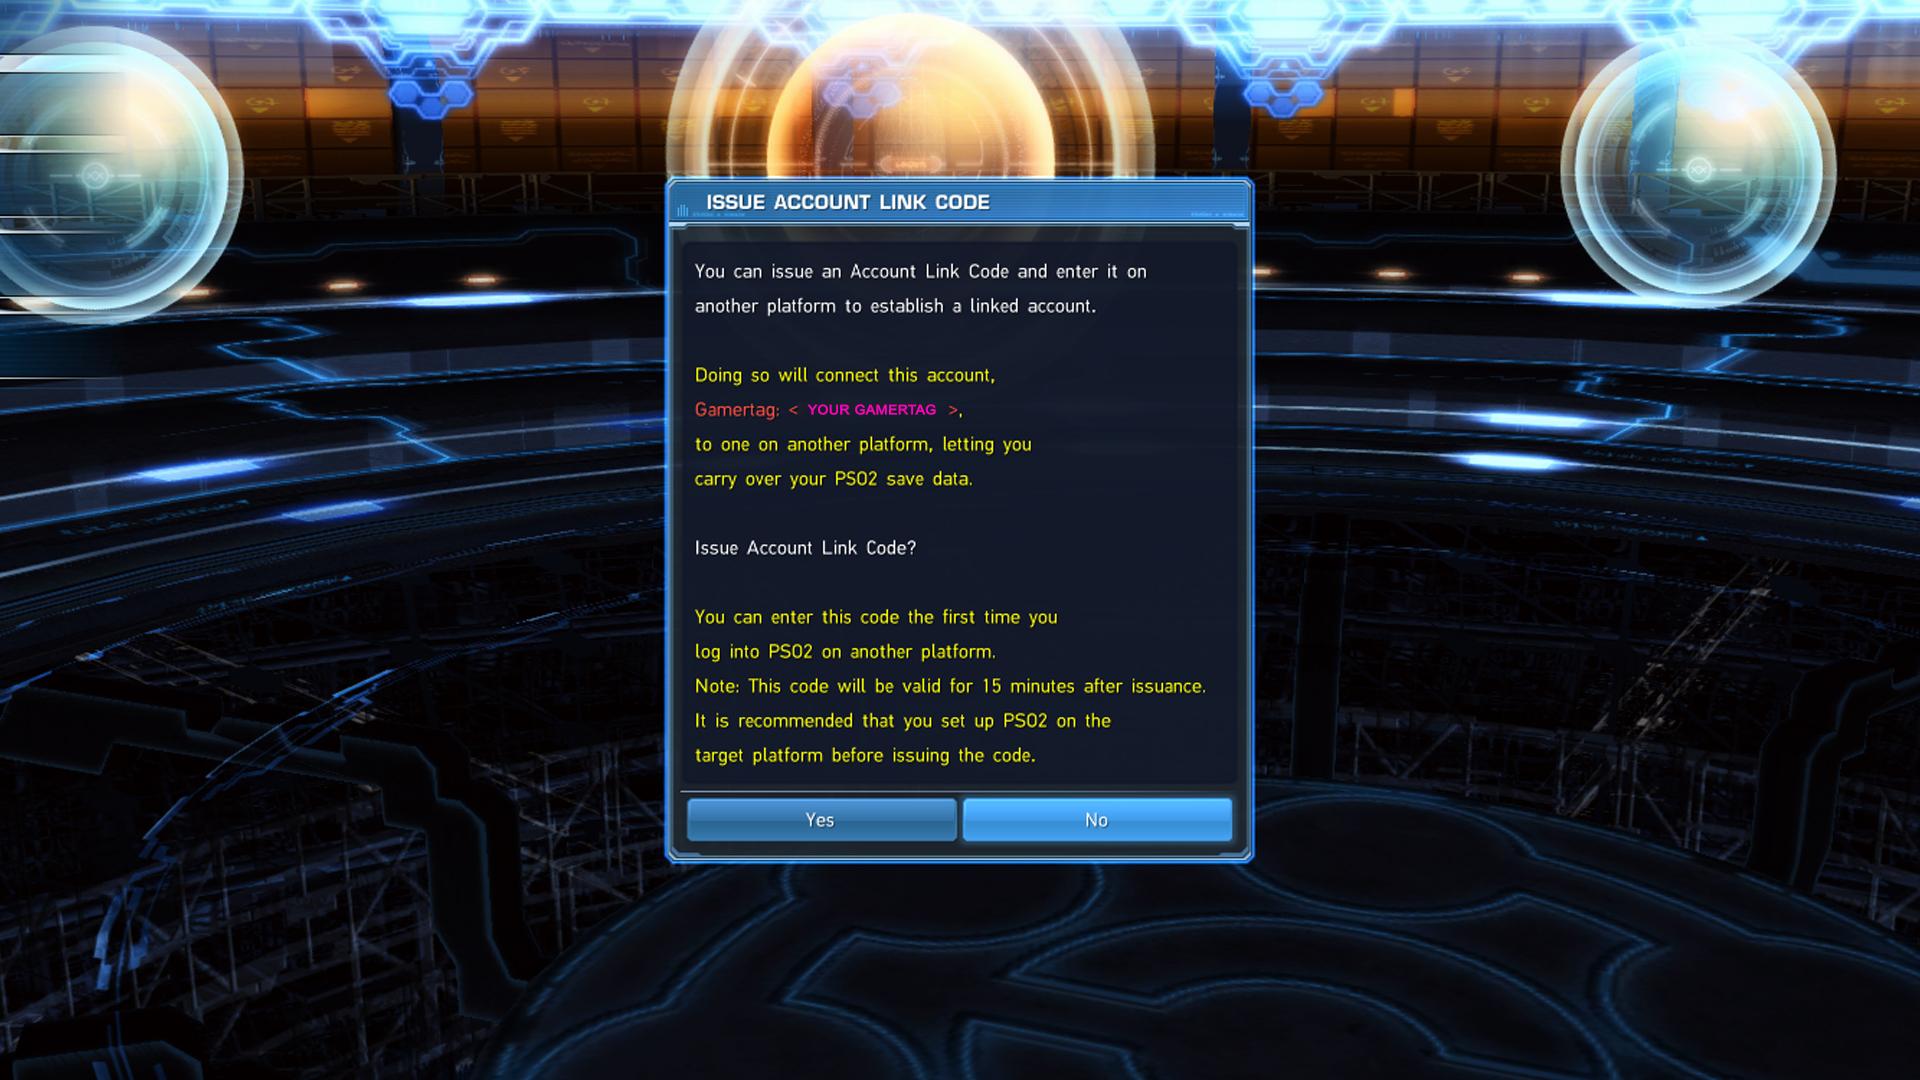 Phantasy Star Online 2 Link Account